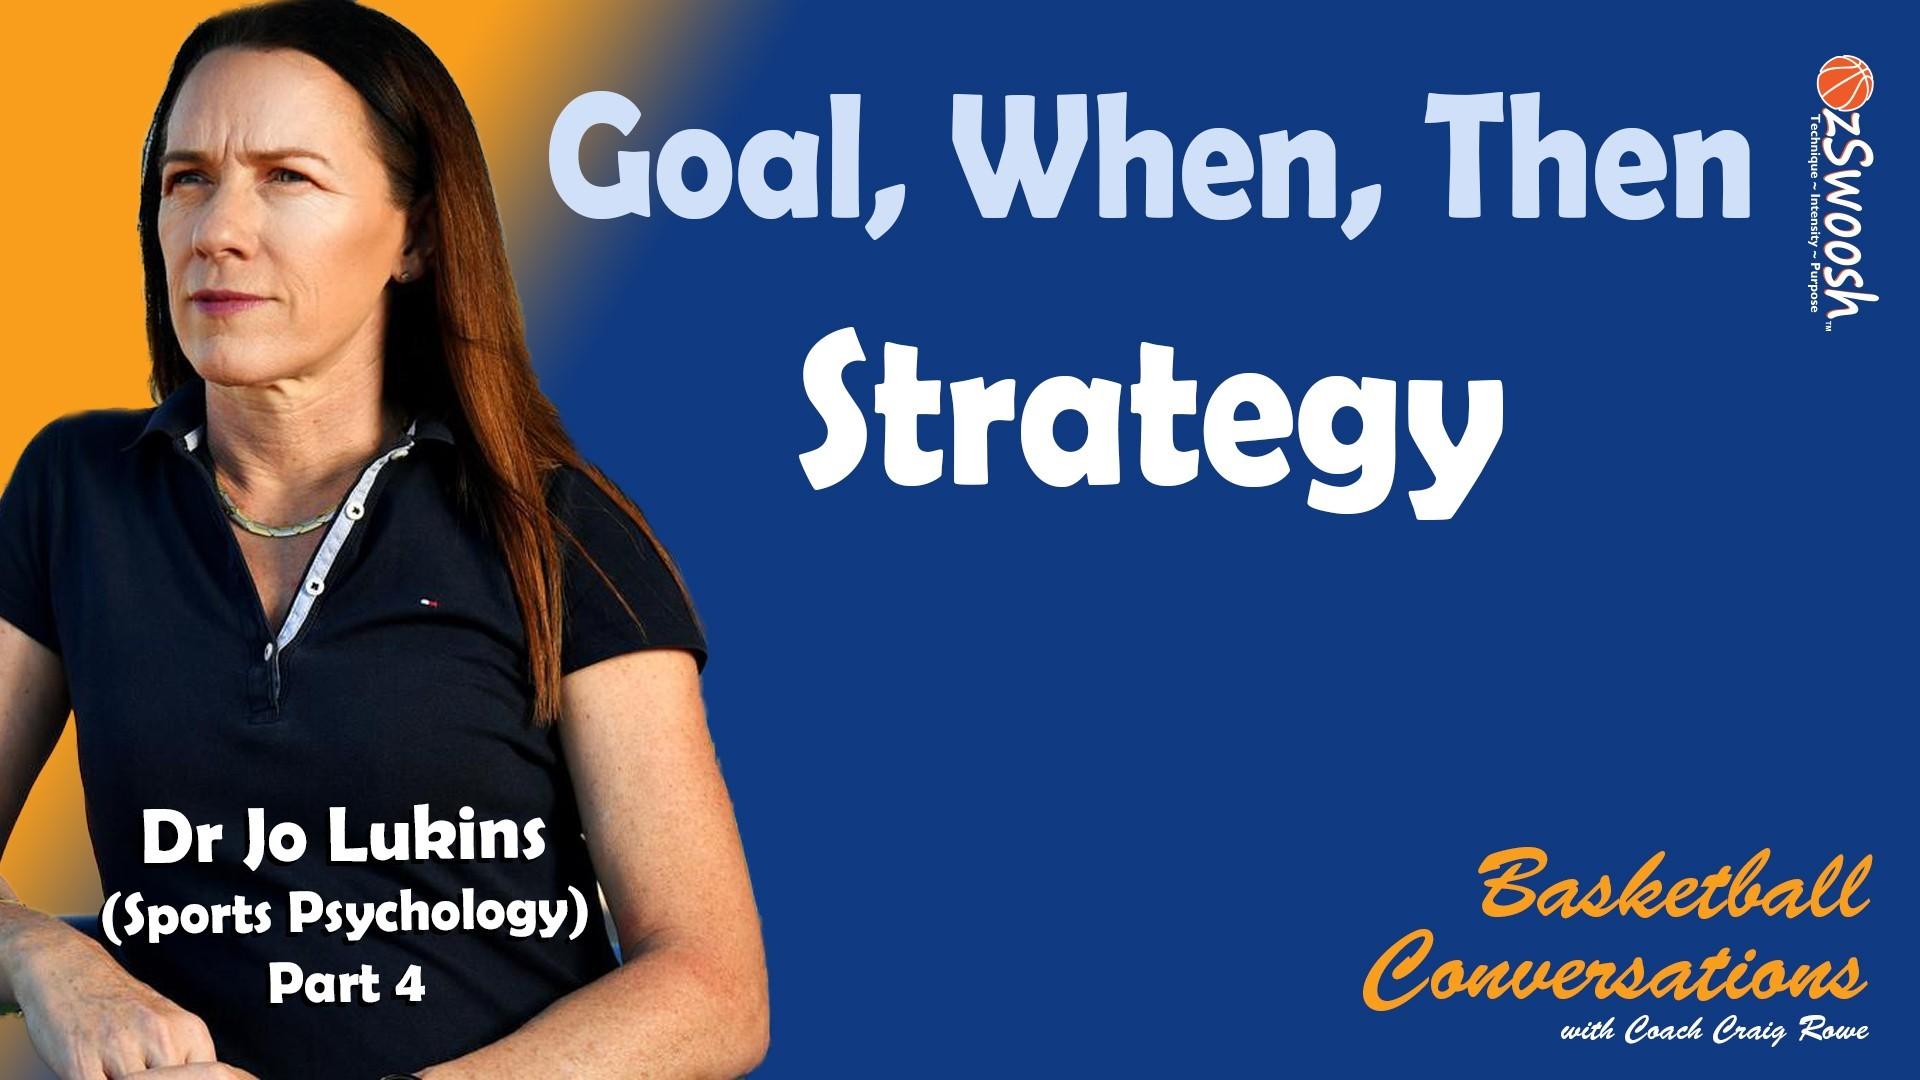 How To Form New Habits - Dr Jo Lukins (Pt 4)